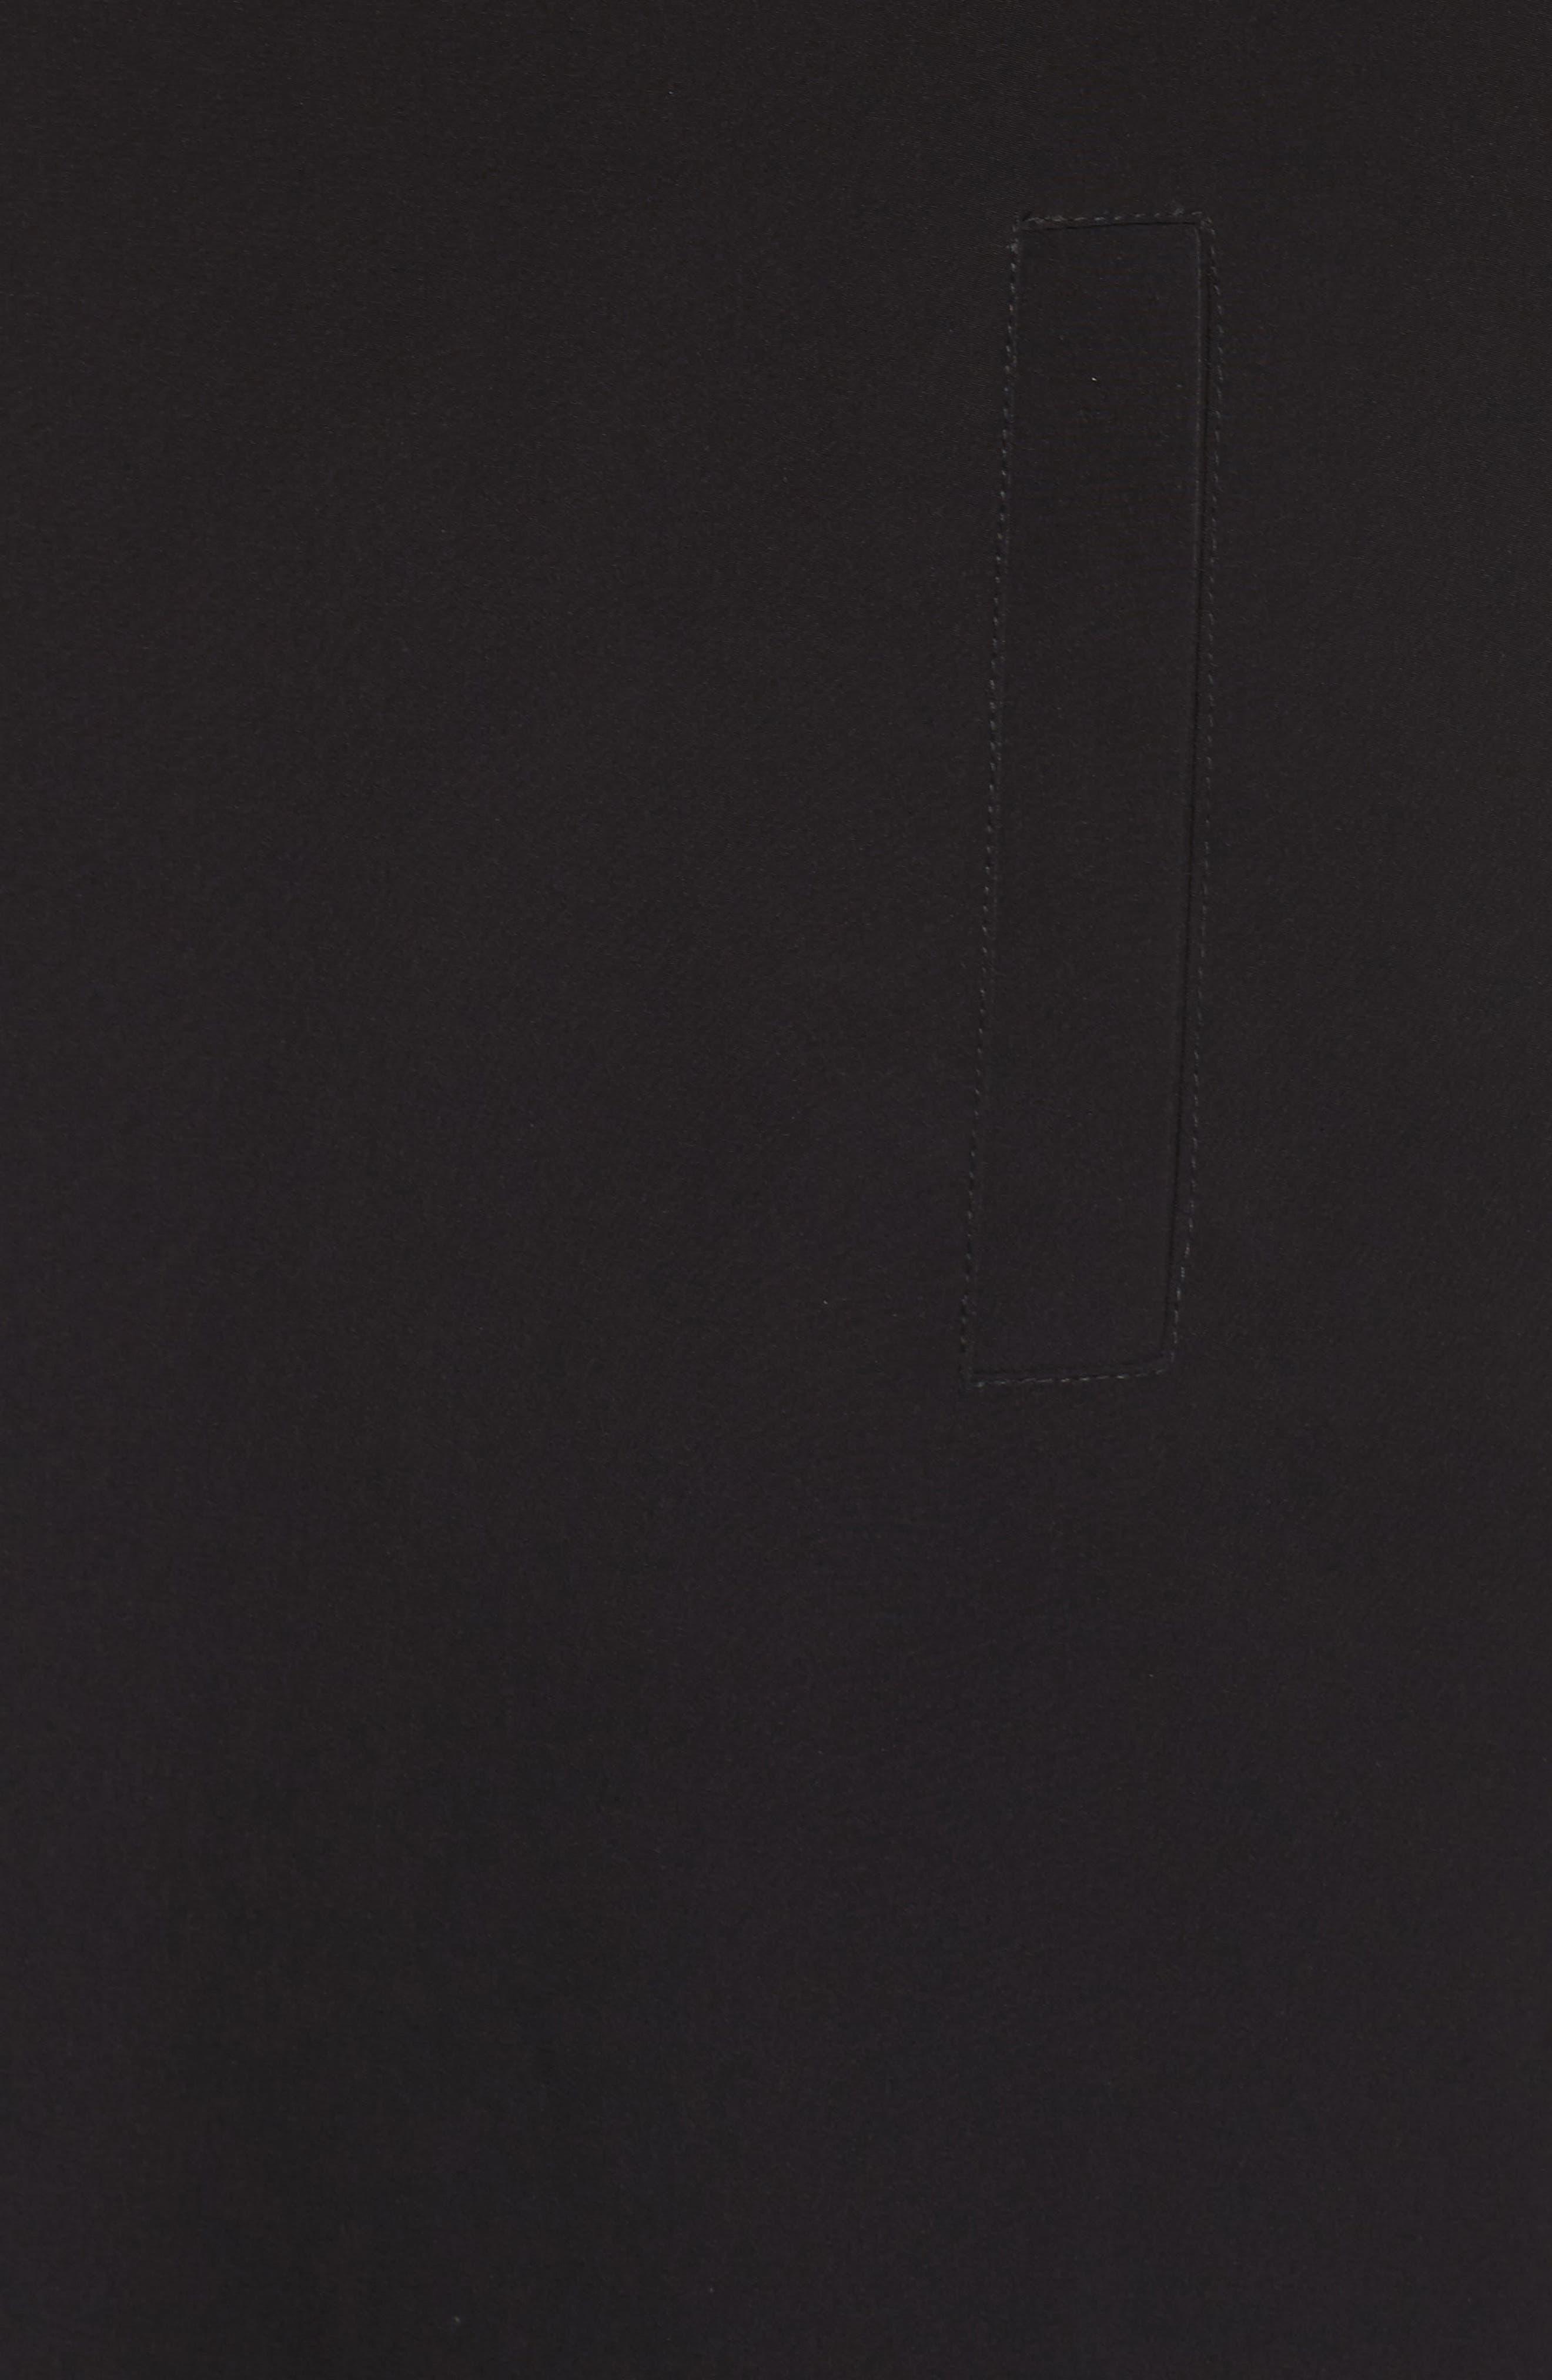 Kaiza Trench Coat,                             Alternate thumbnail 6, color,                             002